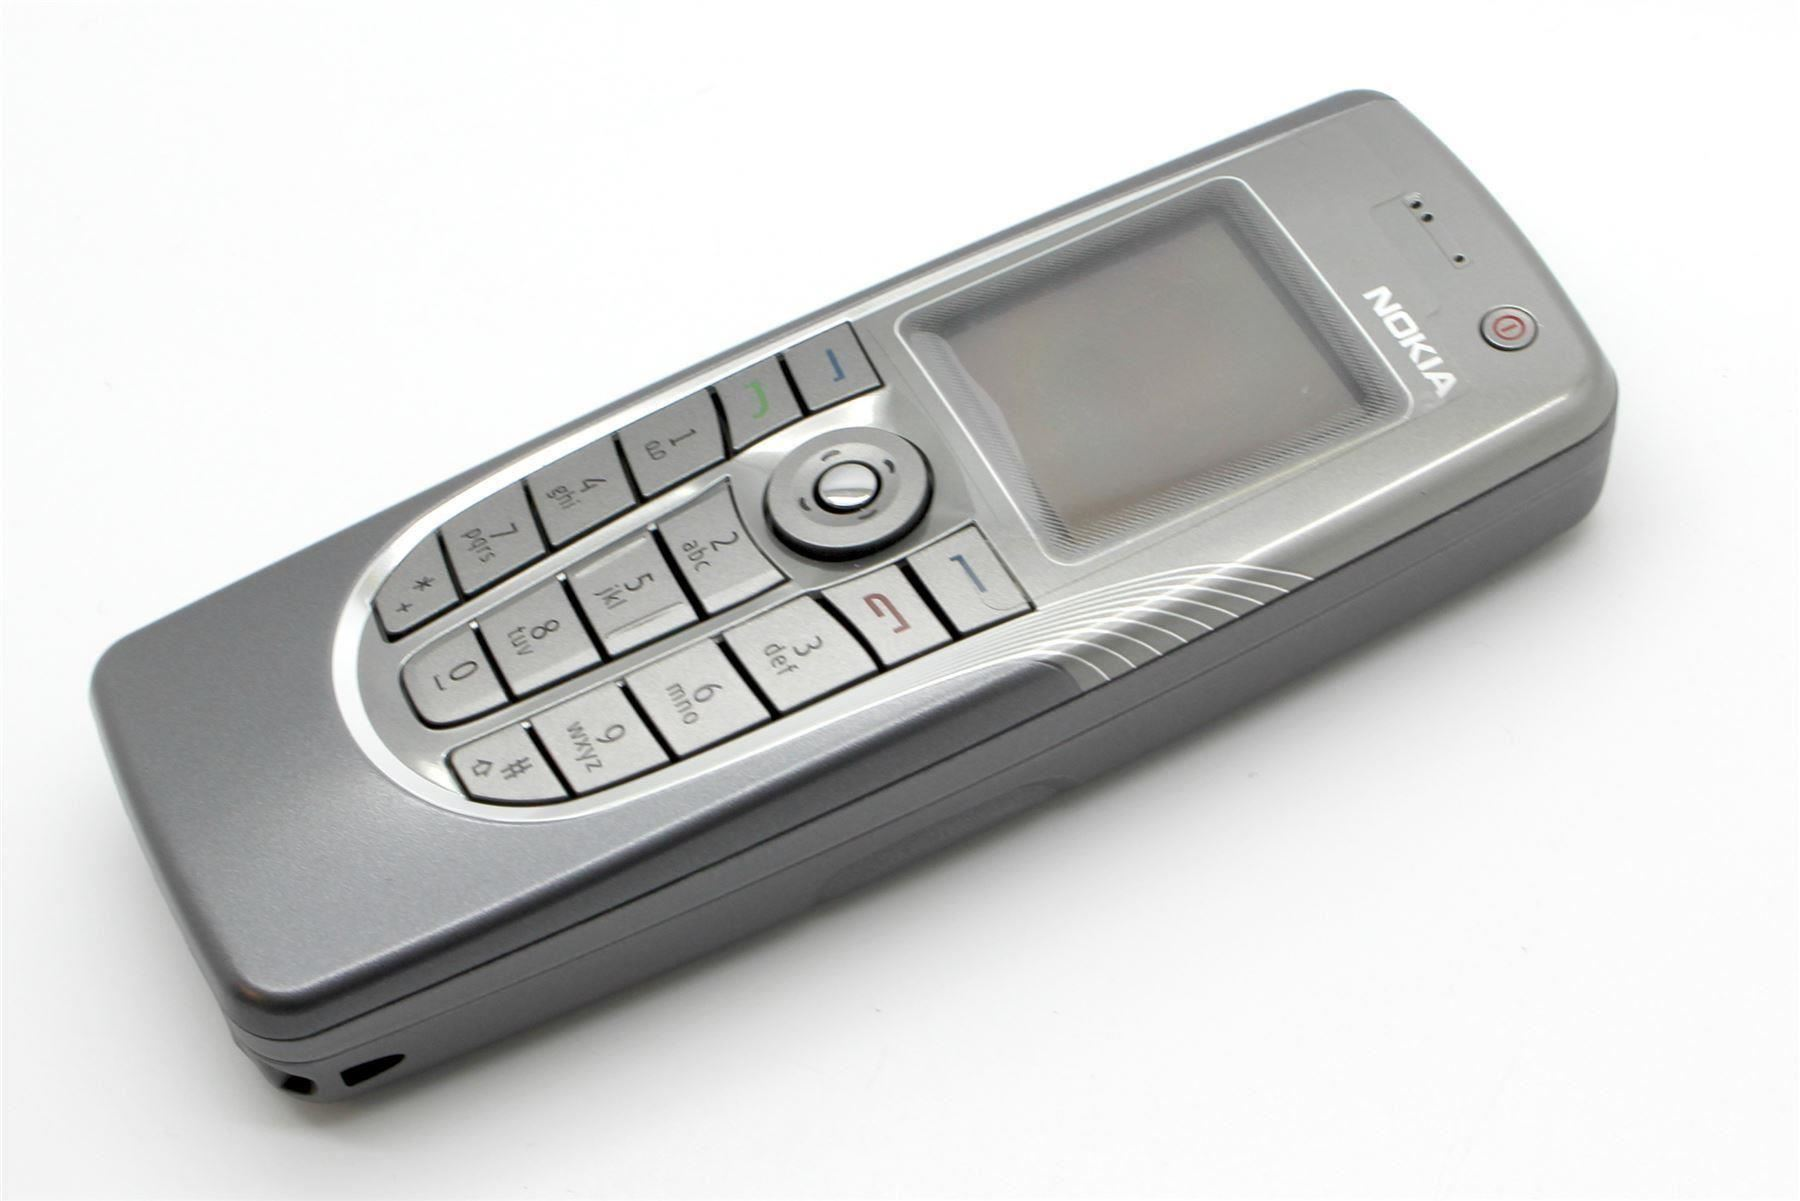 nokia 9300i sliver unlocked mobile phone new condition ebay rh ebay ie Nokia Lumia 9300 nokia 9300 manual